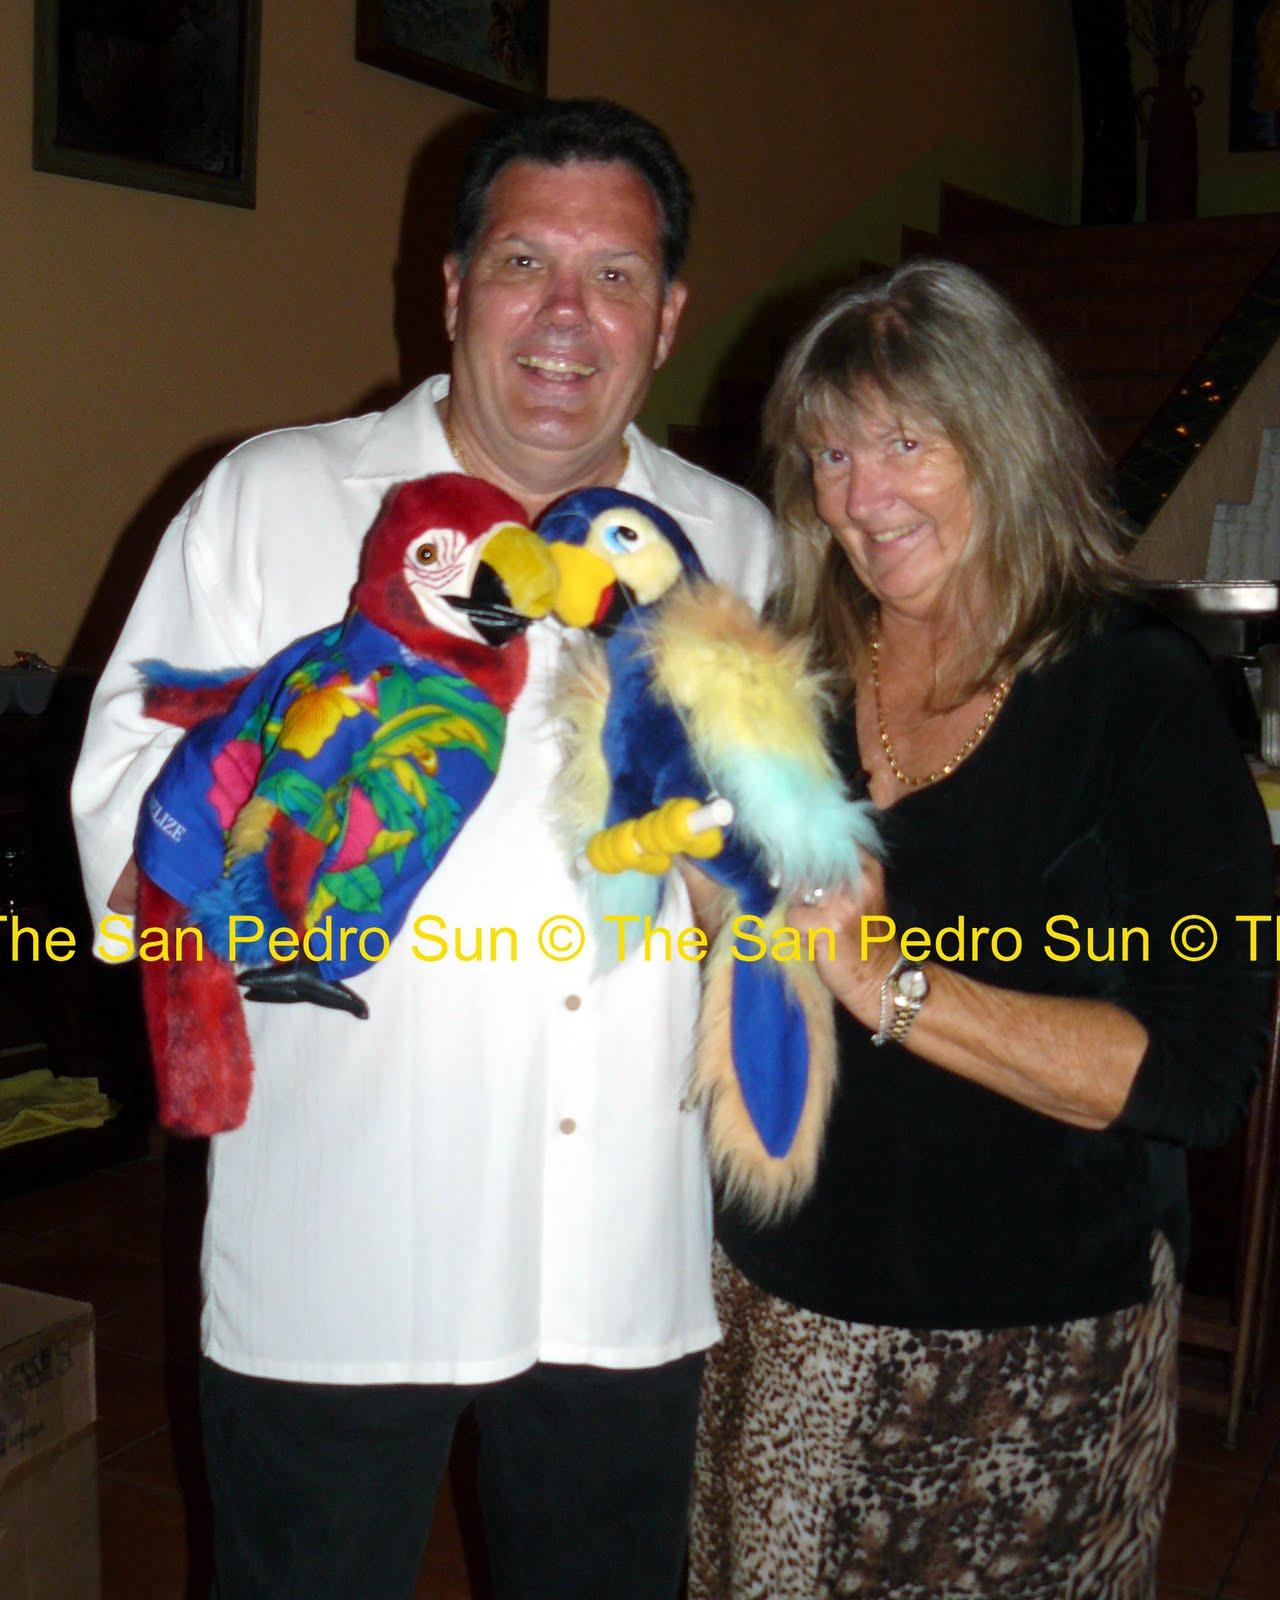 San Pedro Lobsterfest 2010 Kicks Off at El Divino - The San